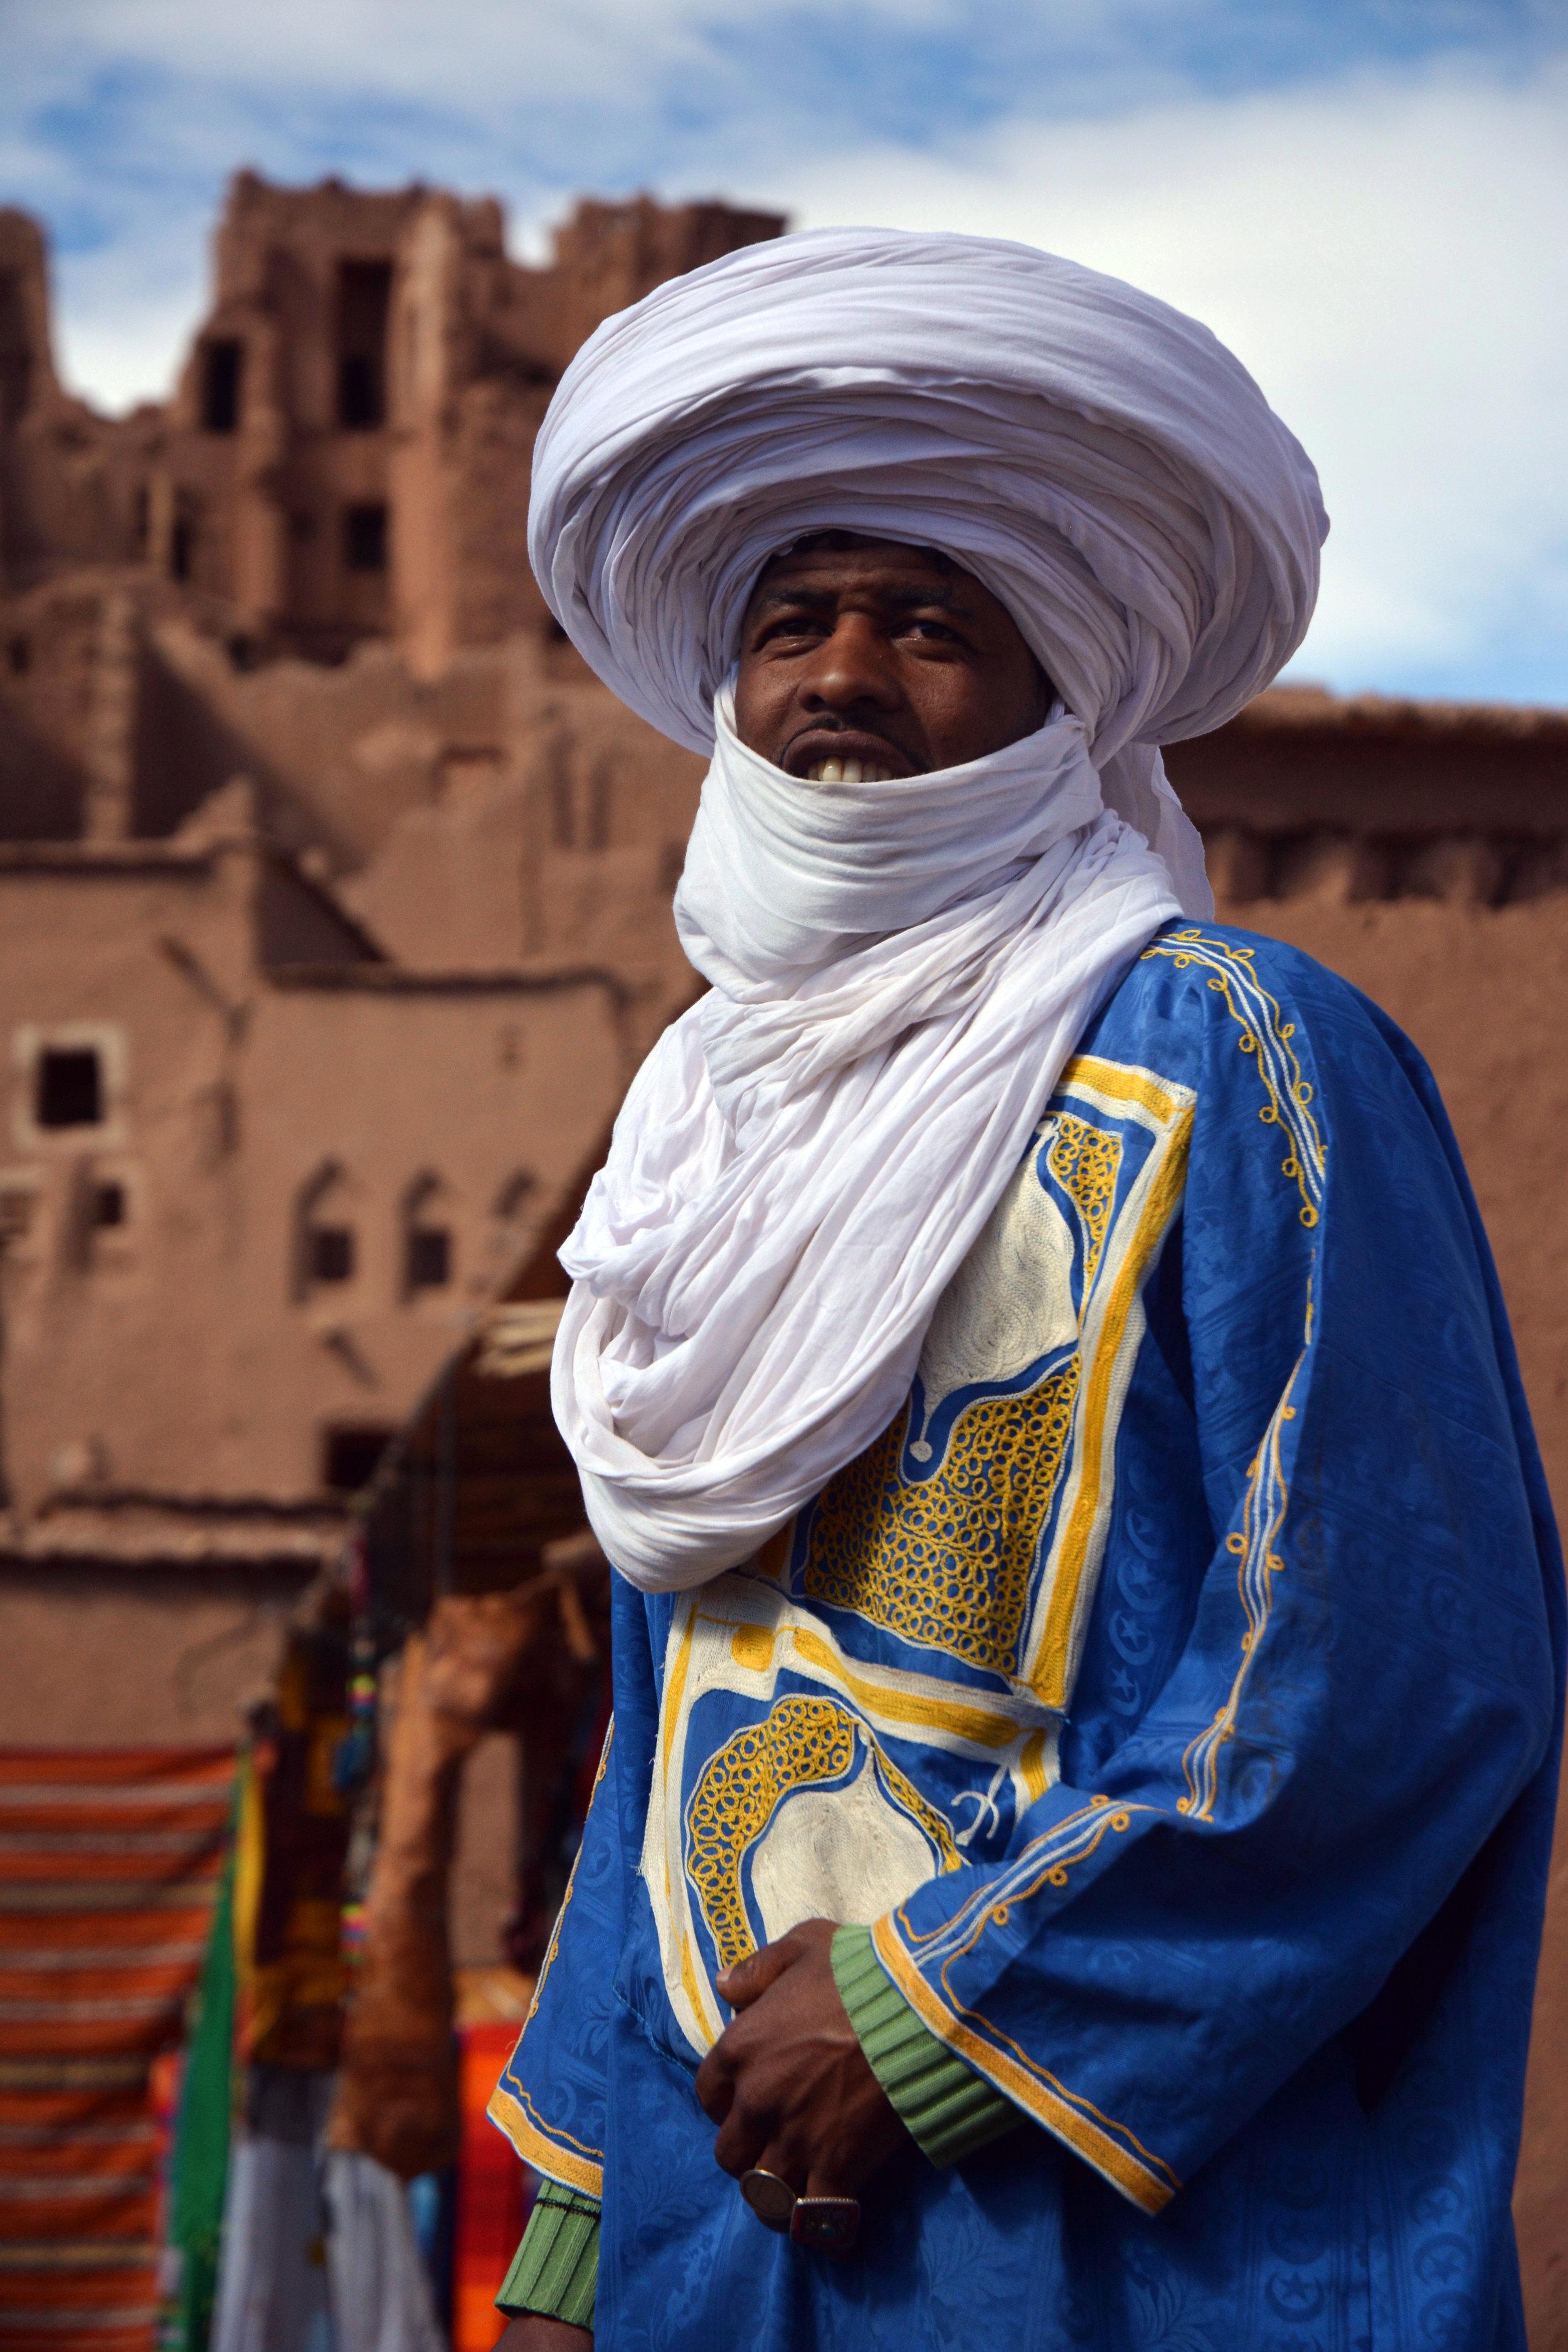 Ali, Ouarzazate, Morocco 2018